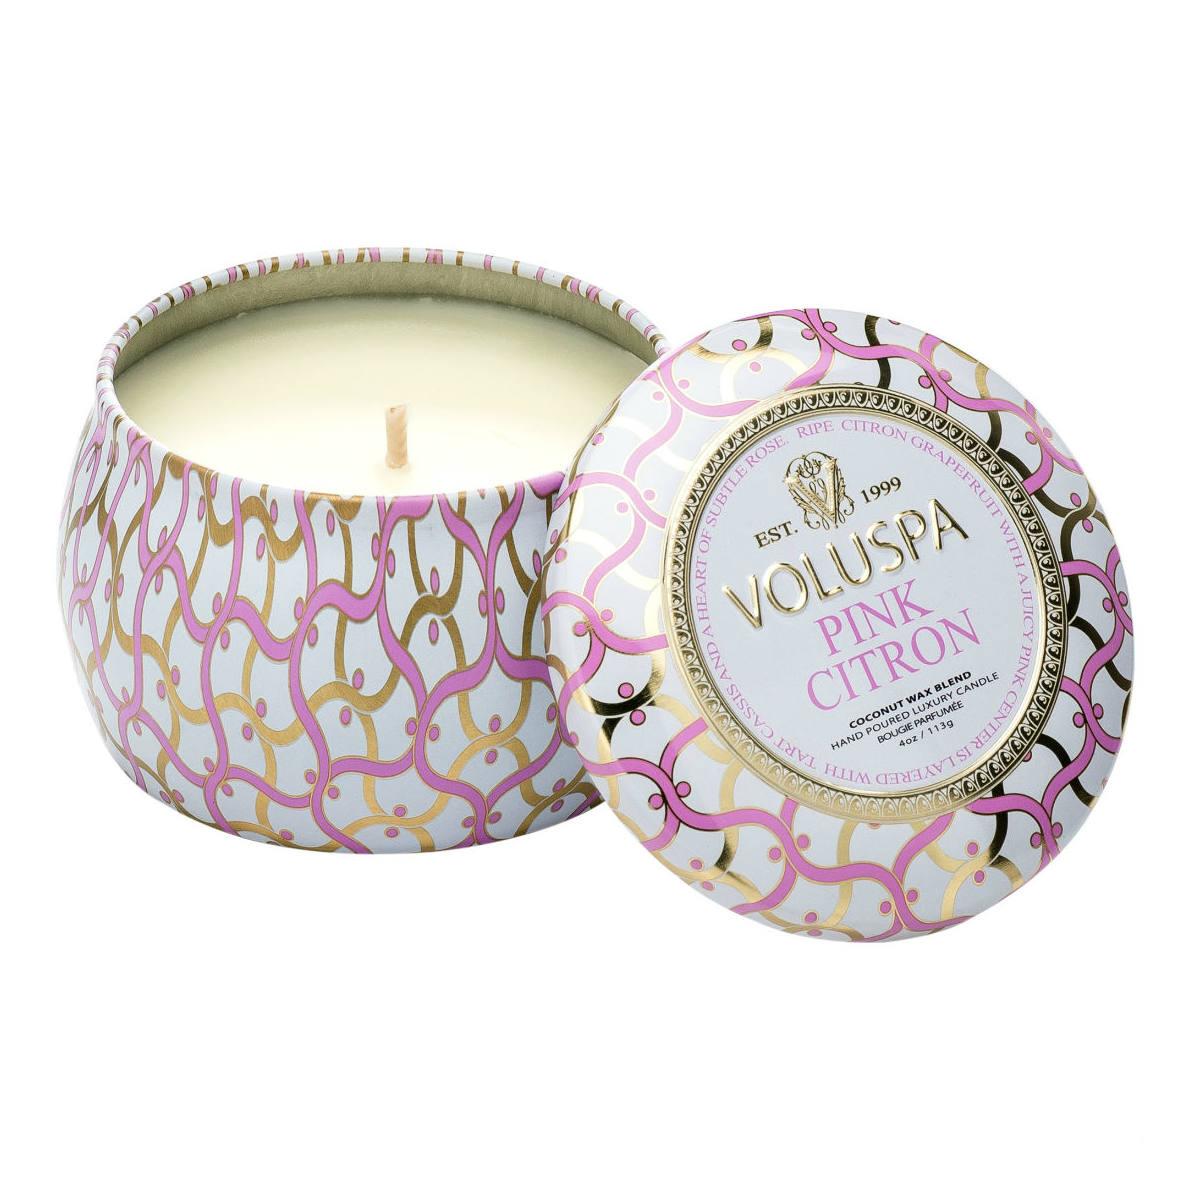 Blanc Pink Citron Mini Tin Candle By Voluspa | Restoration Yard